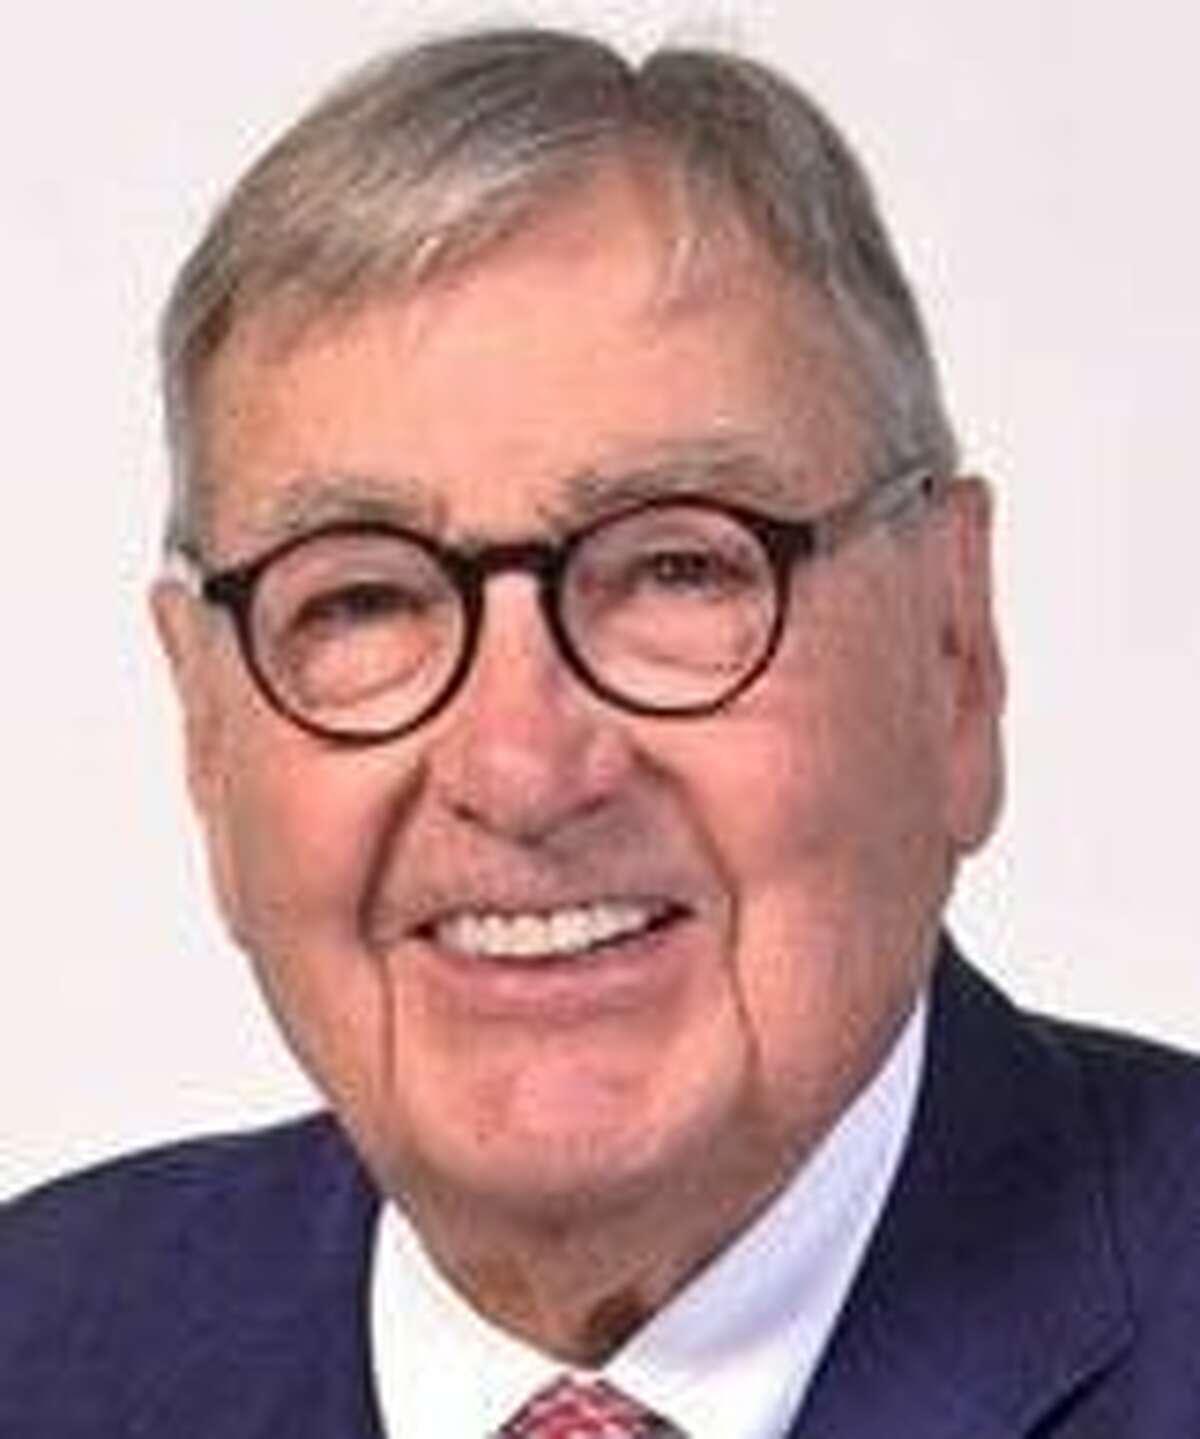 Ralph S. O'Connor